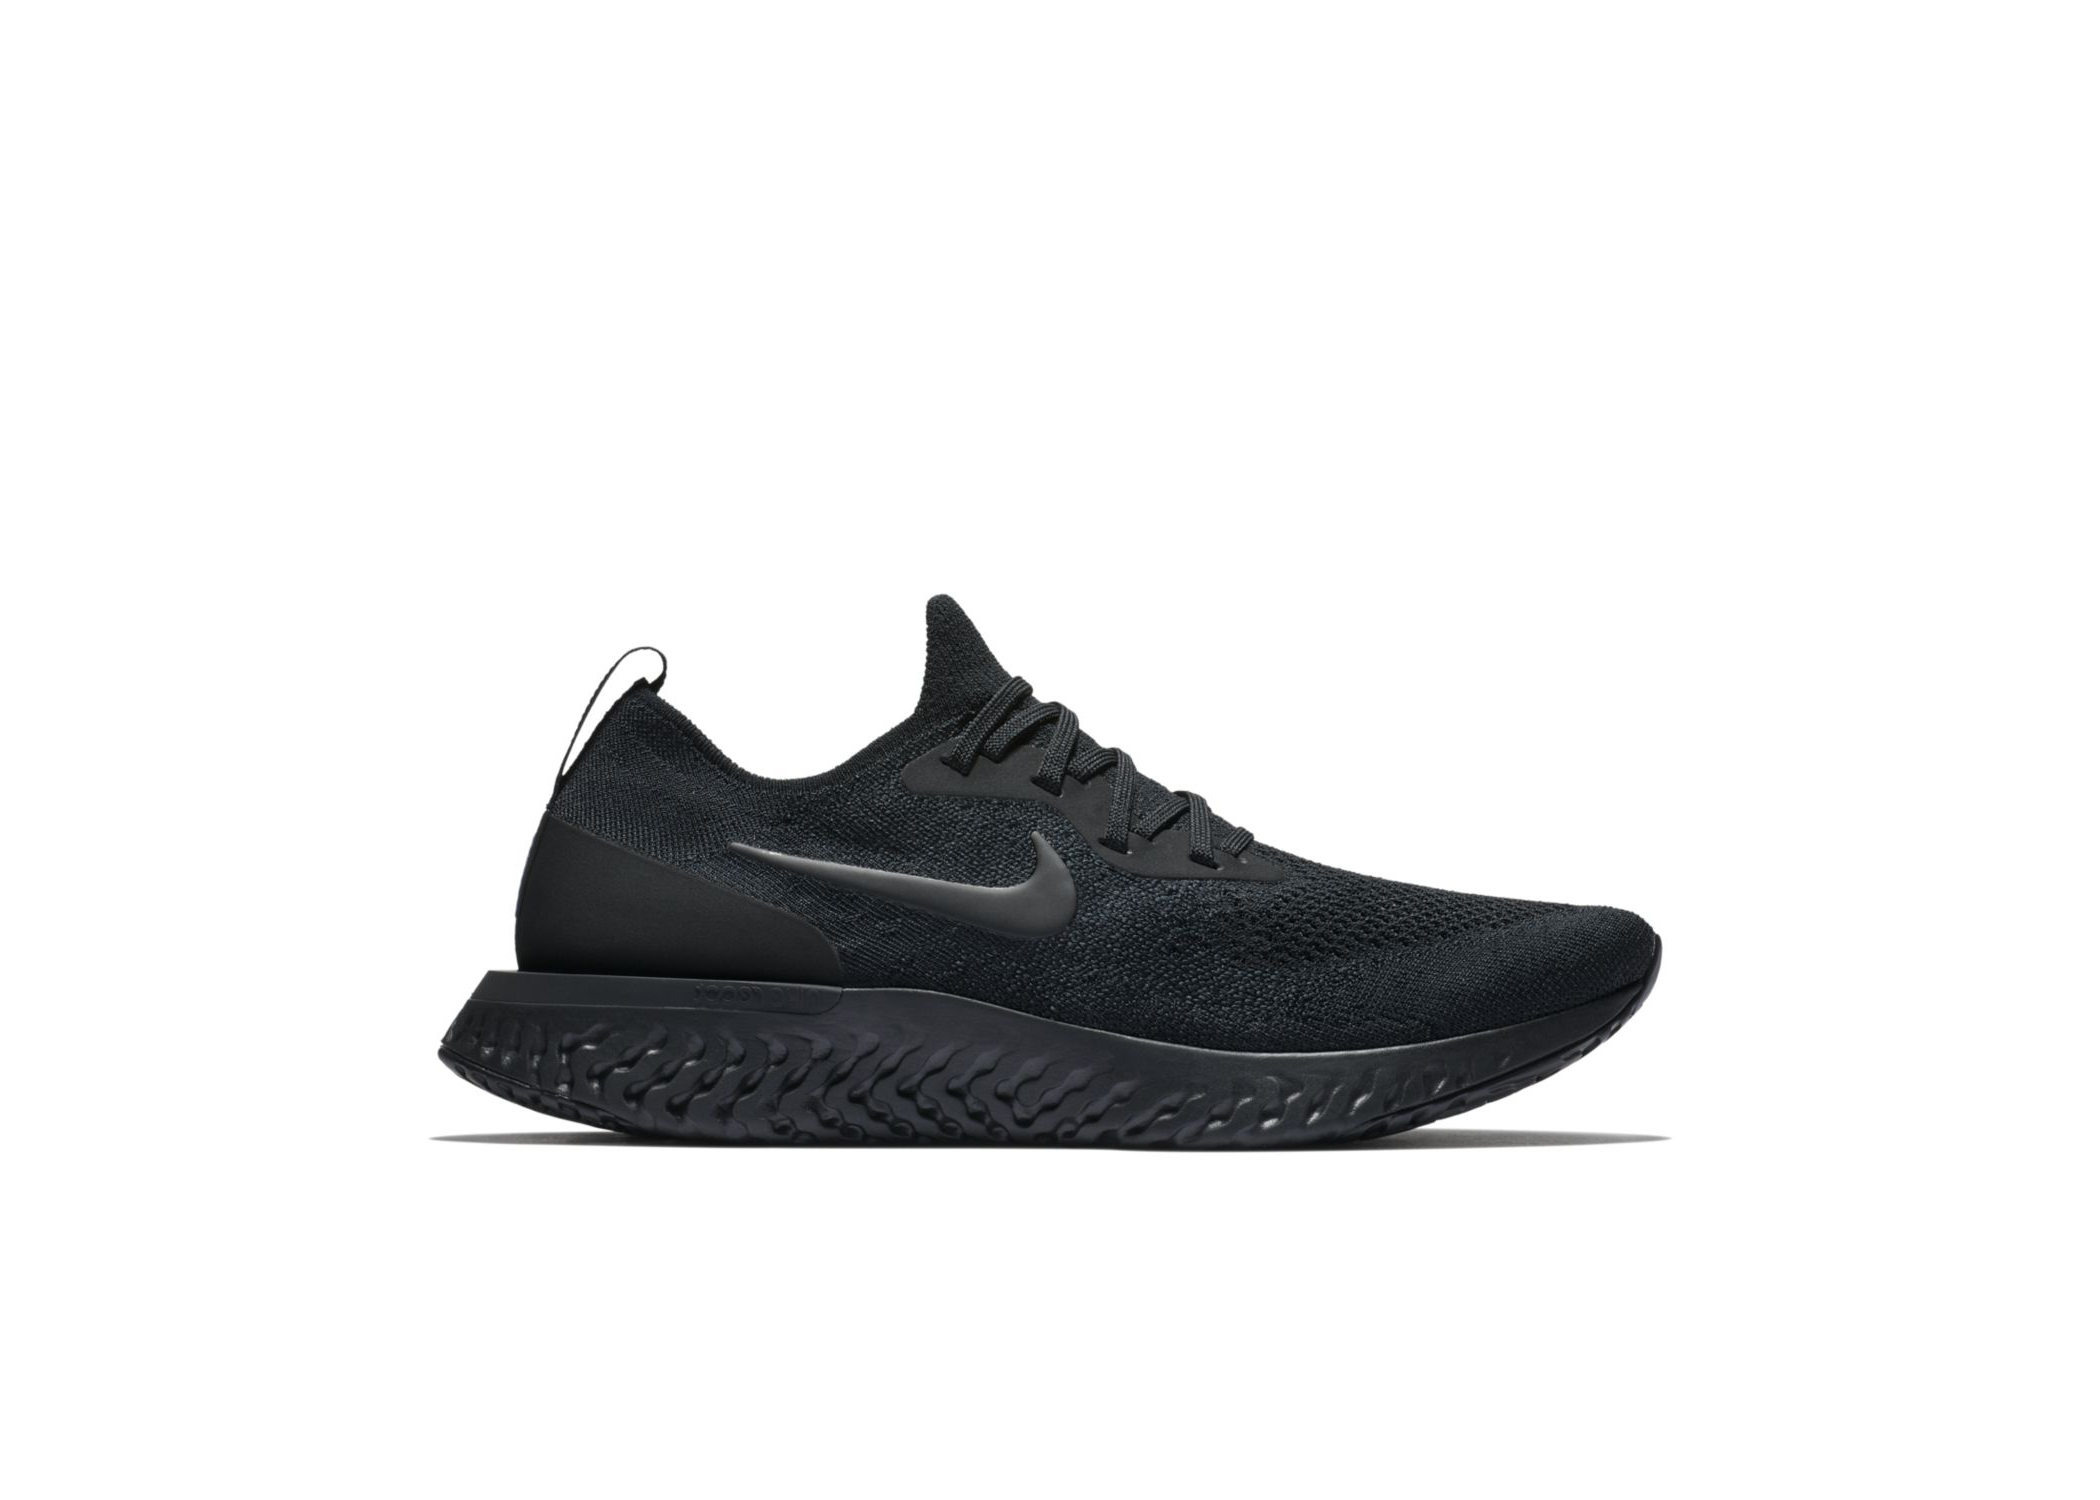 Nike Epic React Flyknit 1 Black